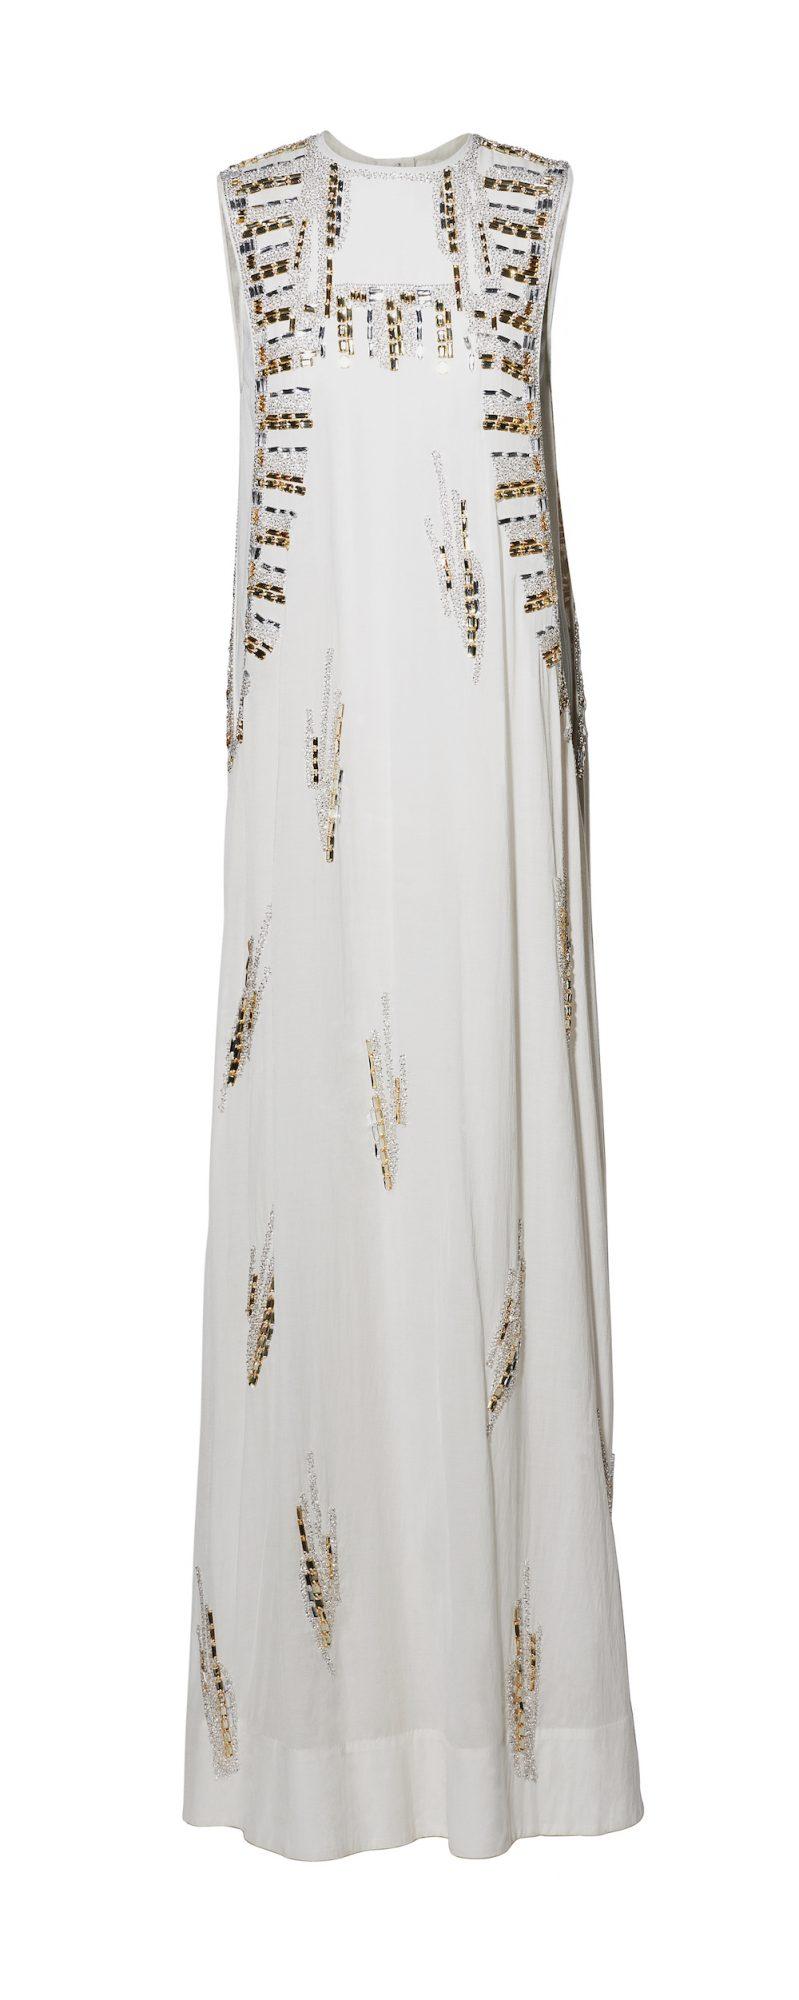 hm-wedding-gown-3.jpg